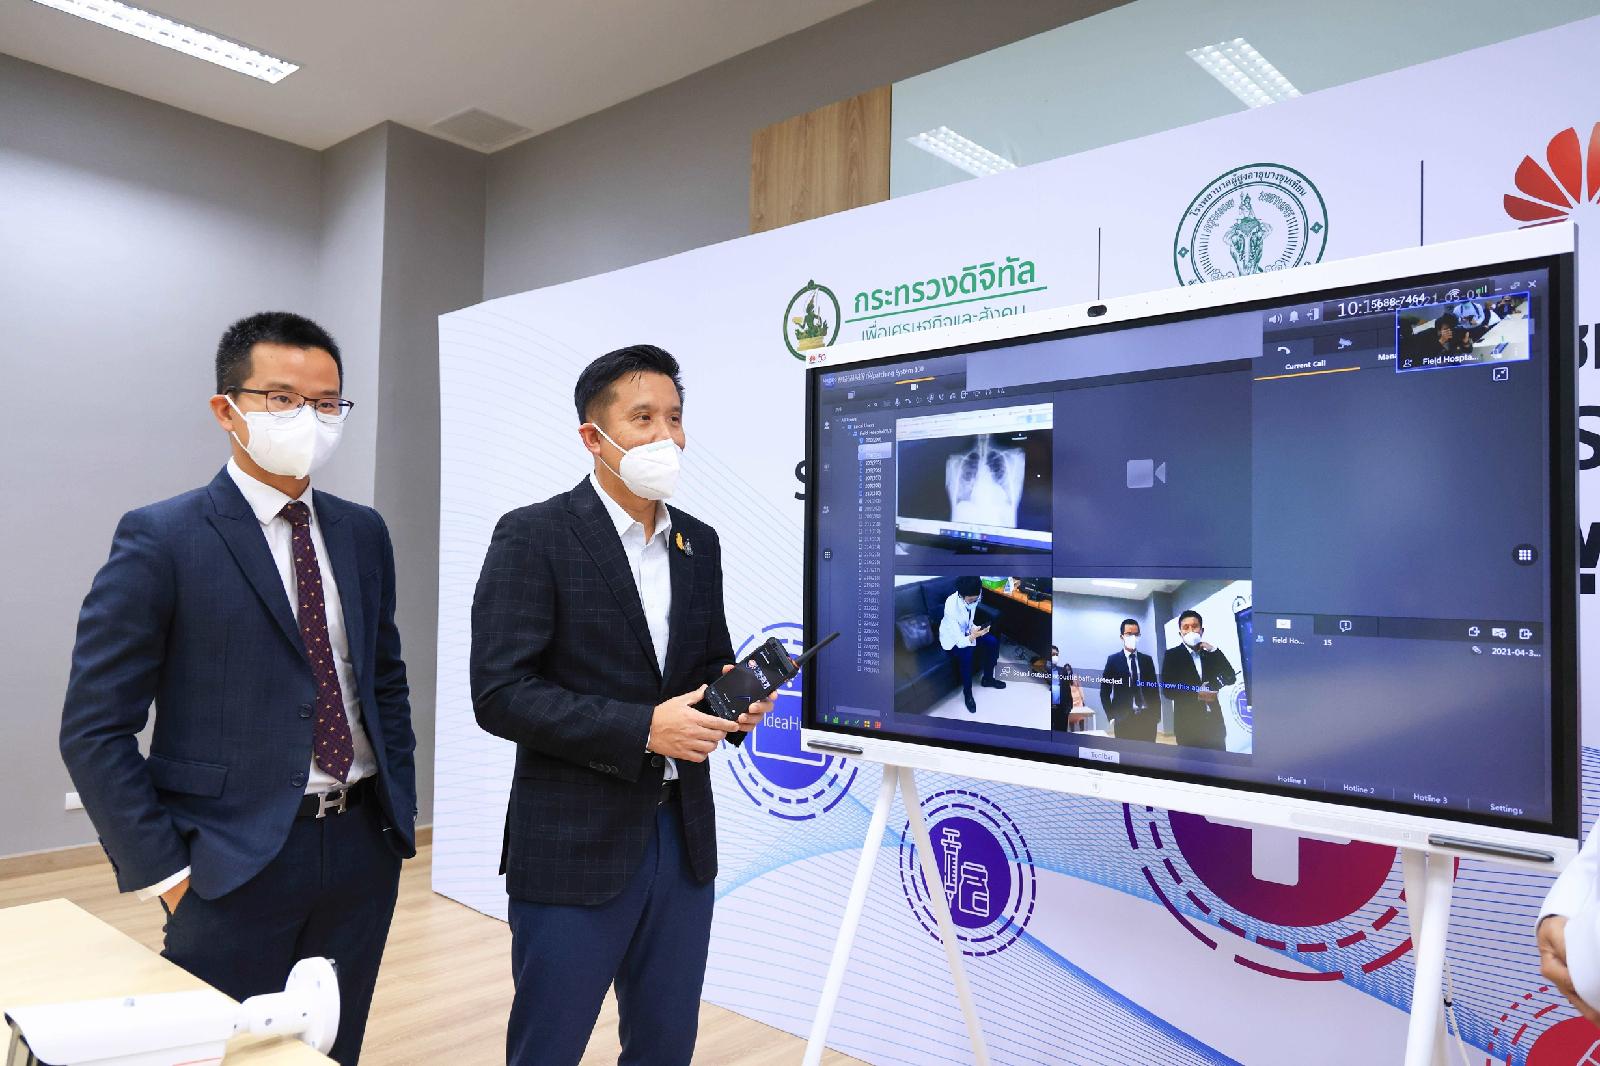 Huawei ยึดมั่นพันธกิจเติบโตไปพร้อมกับประเทศไทย พร้อมช่วยประเทศก้าวผ่านความท้าทายจากโควิด-19 ด้วยเทคโนโลยีเพื่อการแพทย์